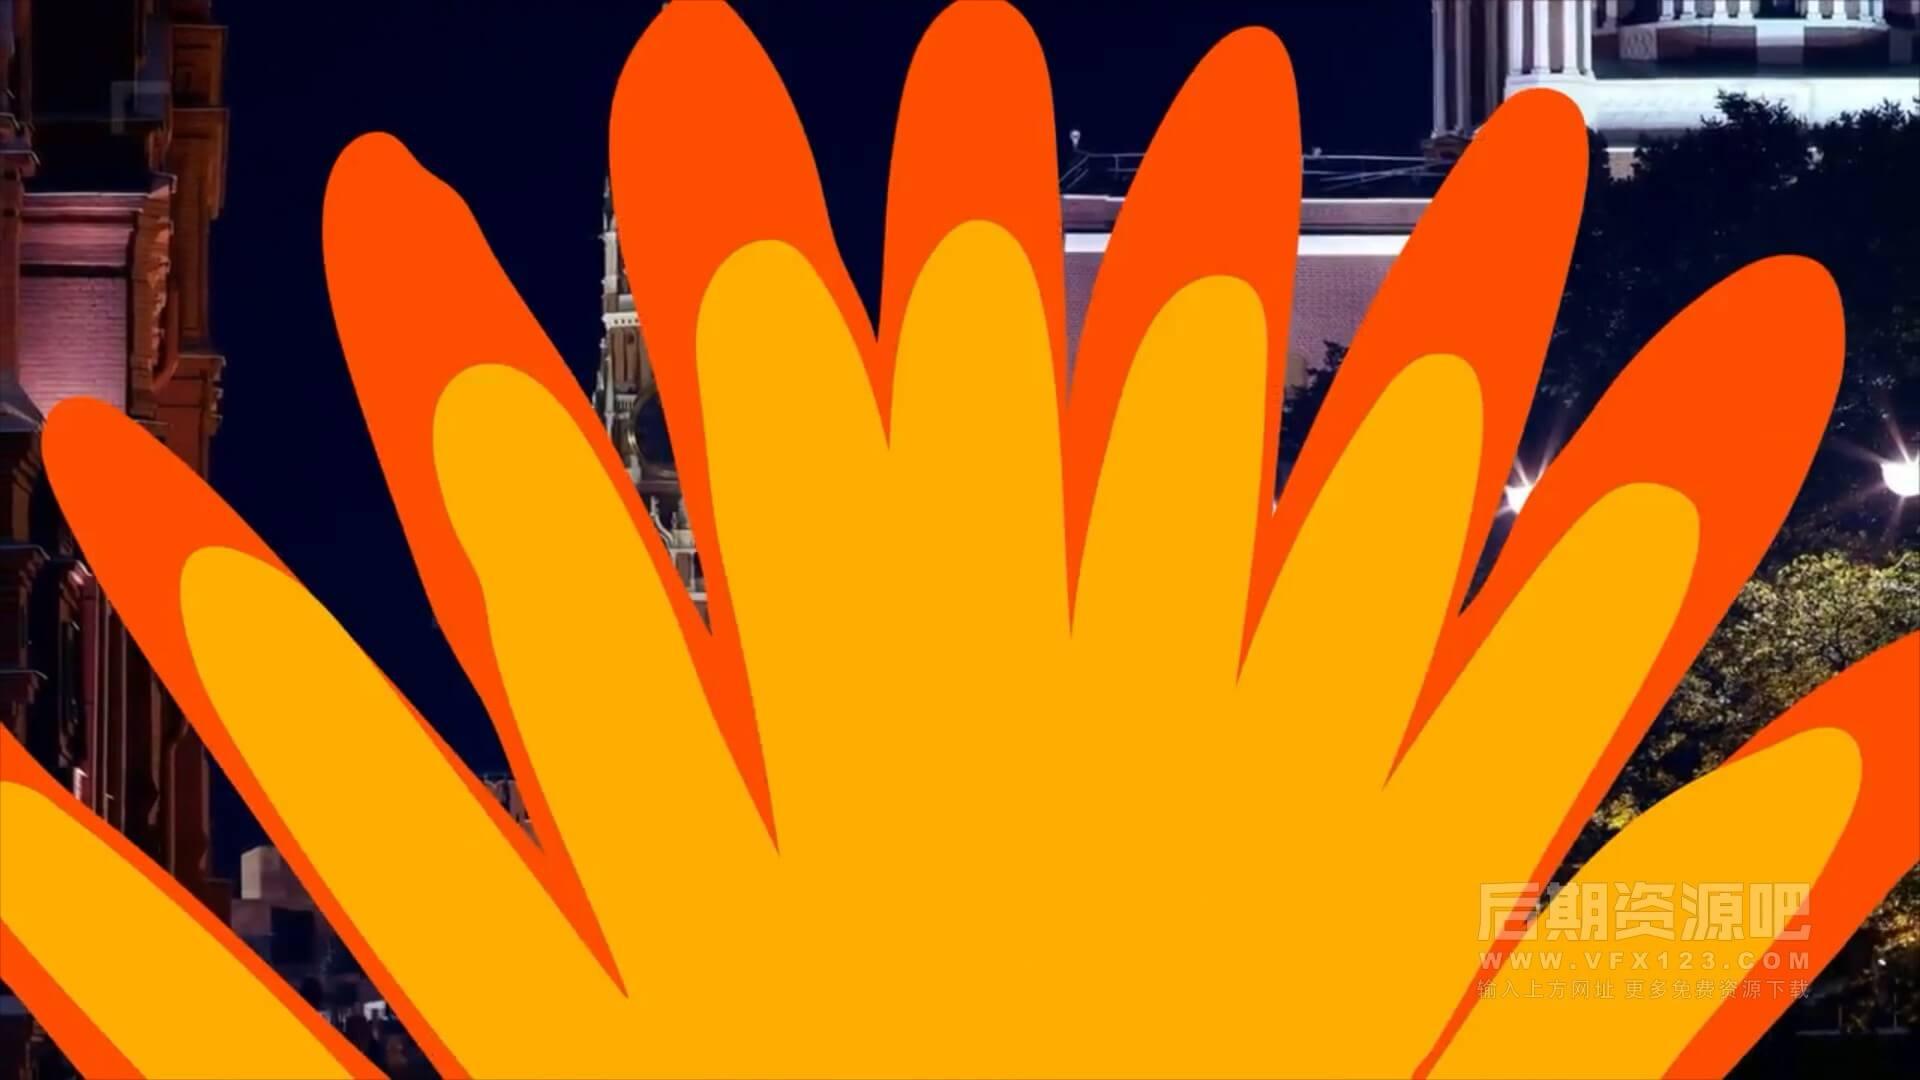 Fcpx转场插件 16组手绘卡通形状过渡转场预设 Hand Drawn Transitions